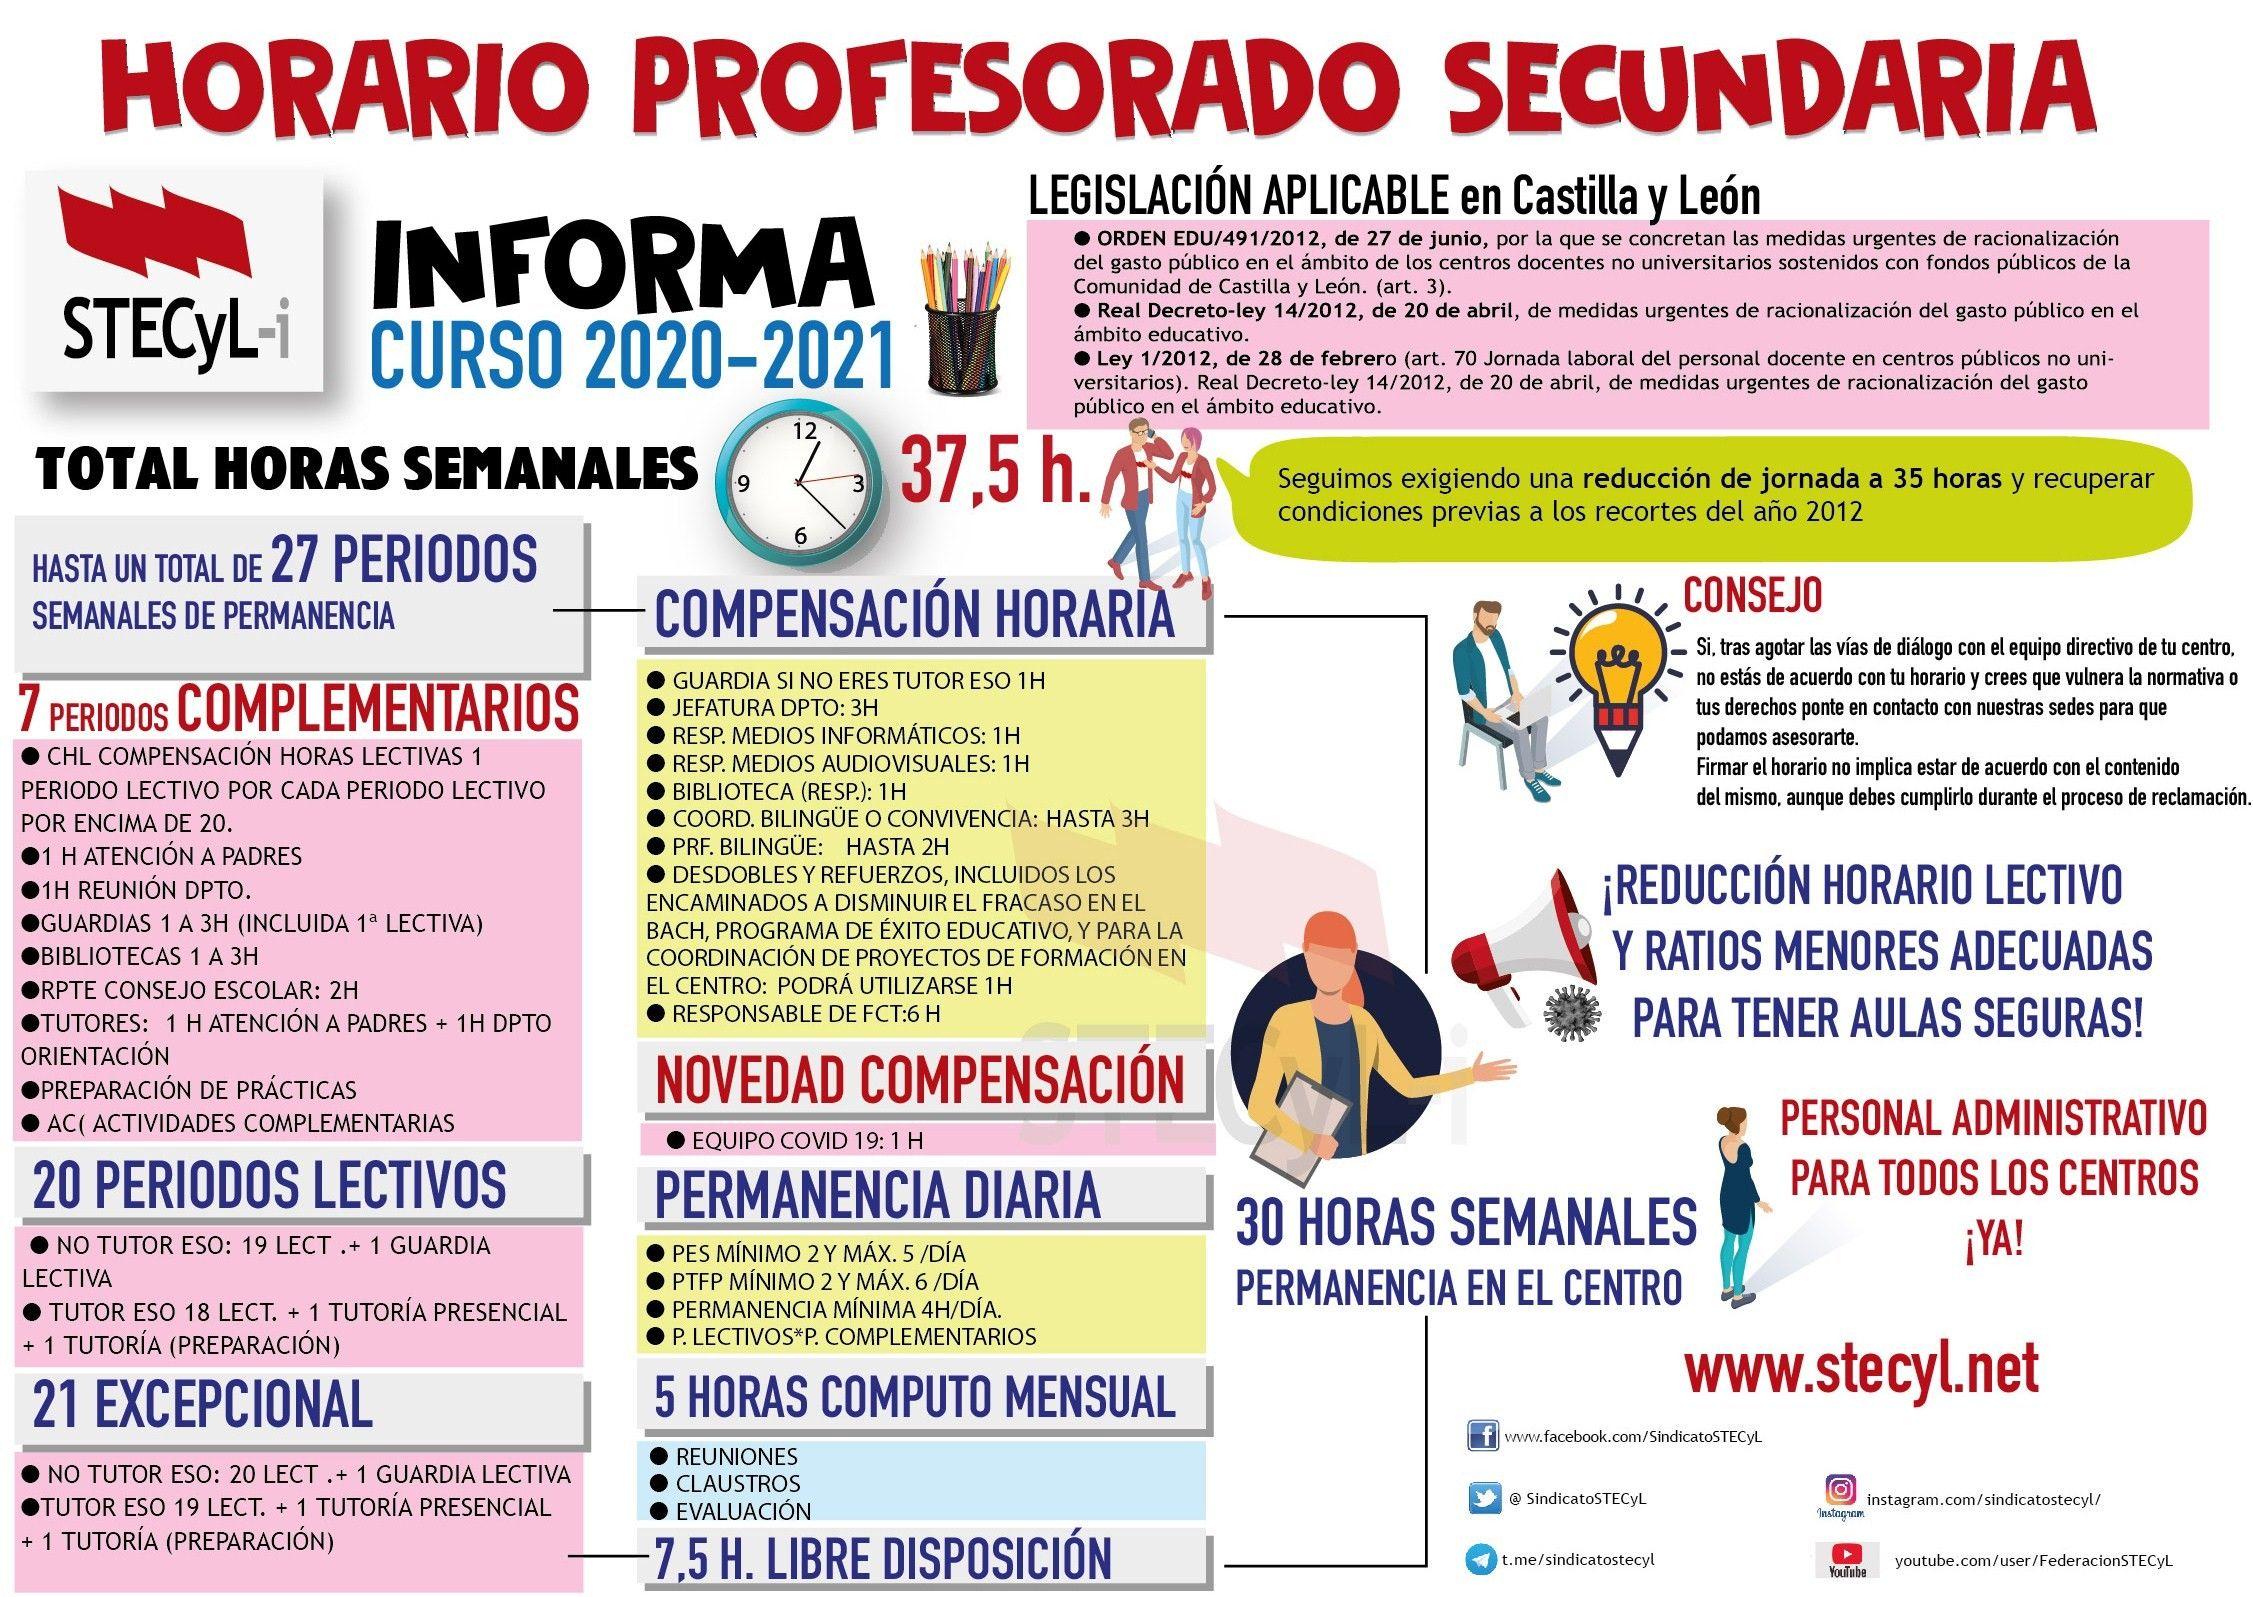 Horario EEMM 20-21